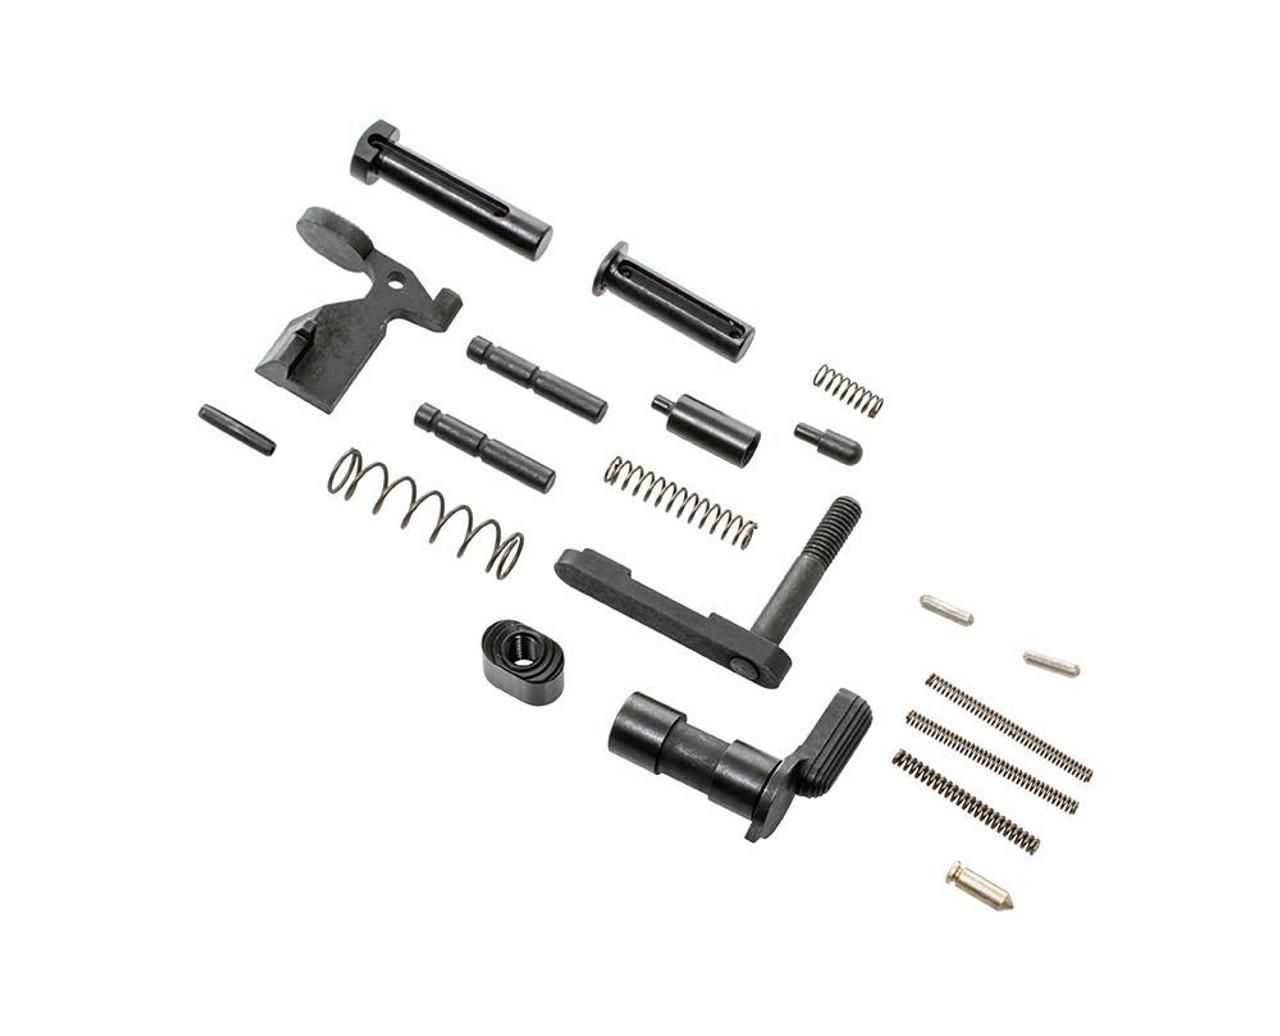 CMMG Gunbuilders Lower Parts Kit (LPK)